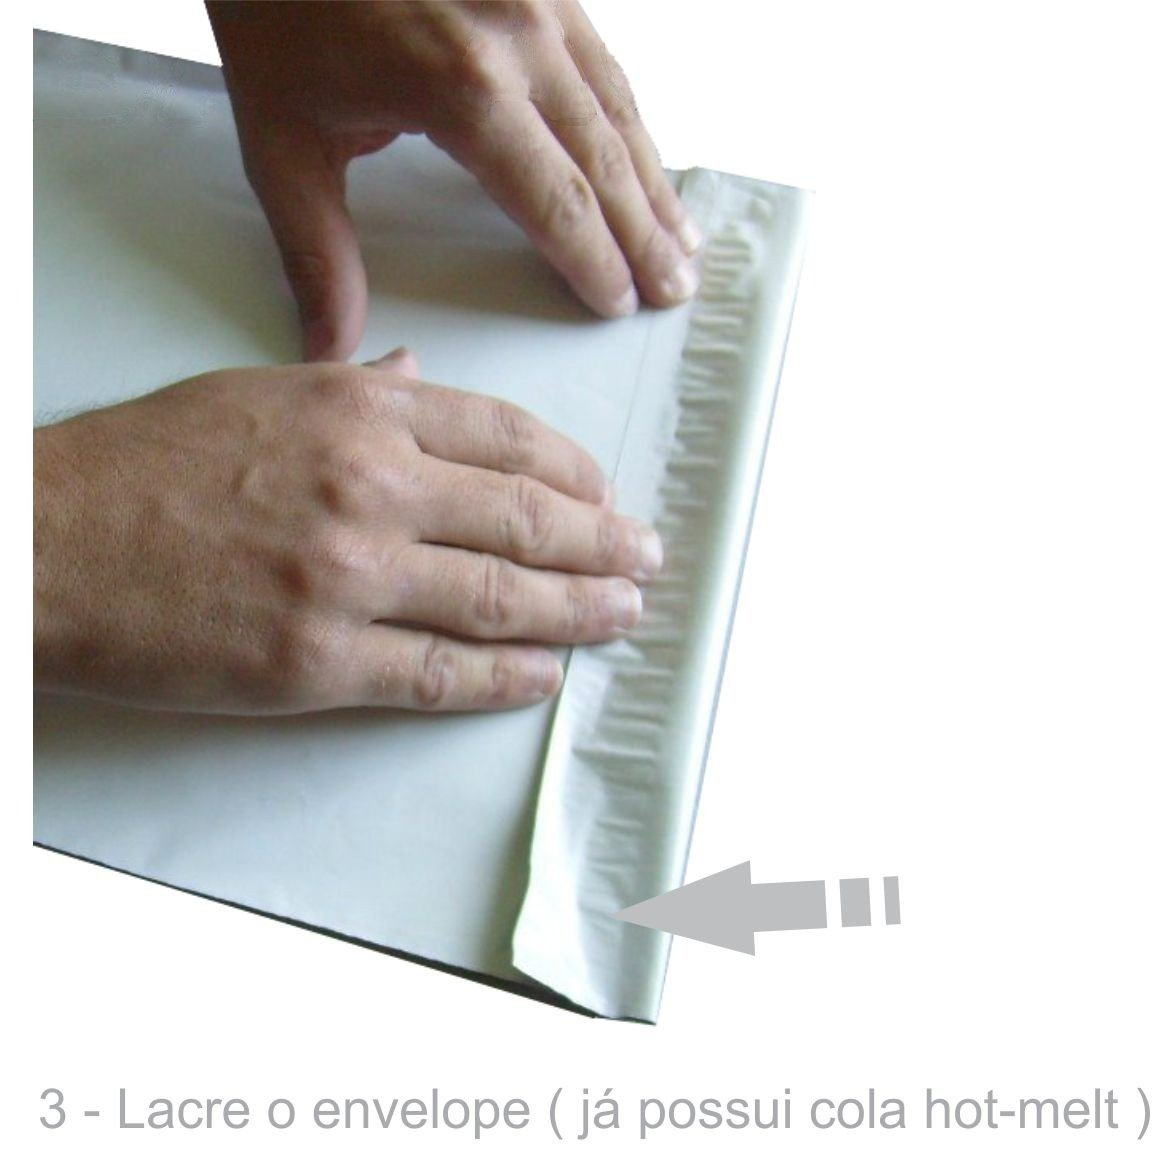 Envelope Plástico Segurança Lacre Tipo Sedex 50x40 (250 ou 500 Unidades)